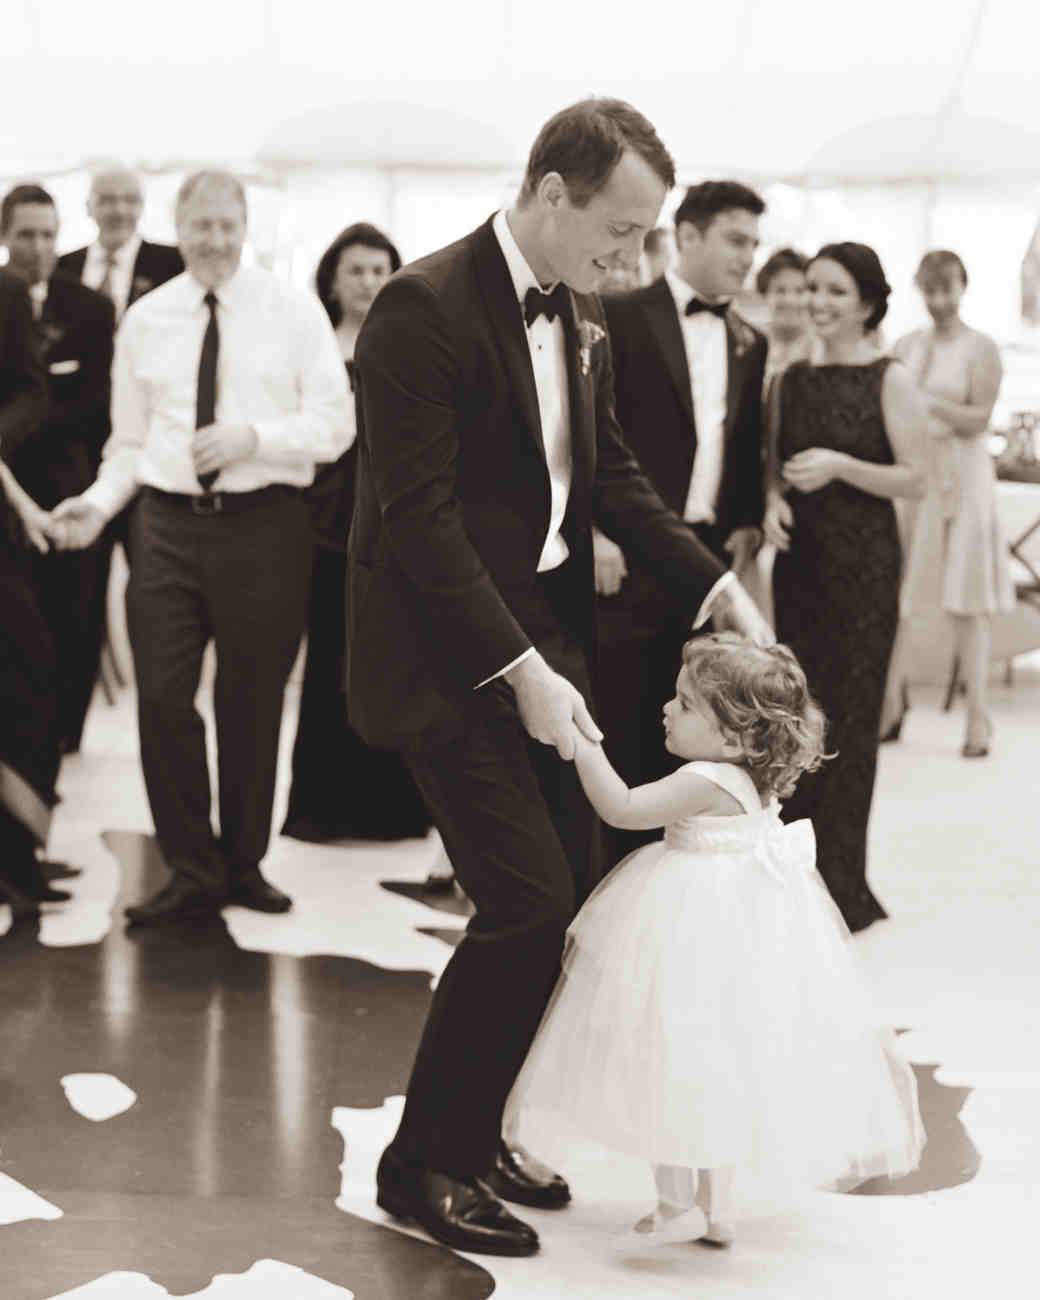 ali-andrew-wedding-wyoming-200-s111942-bw.jpg